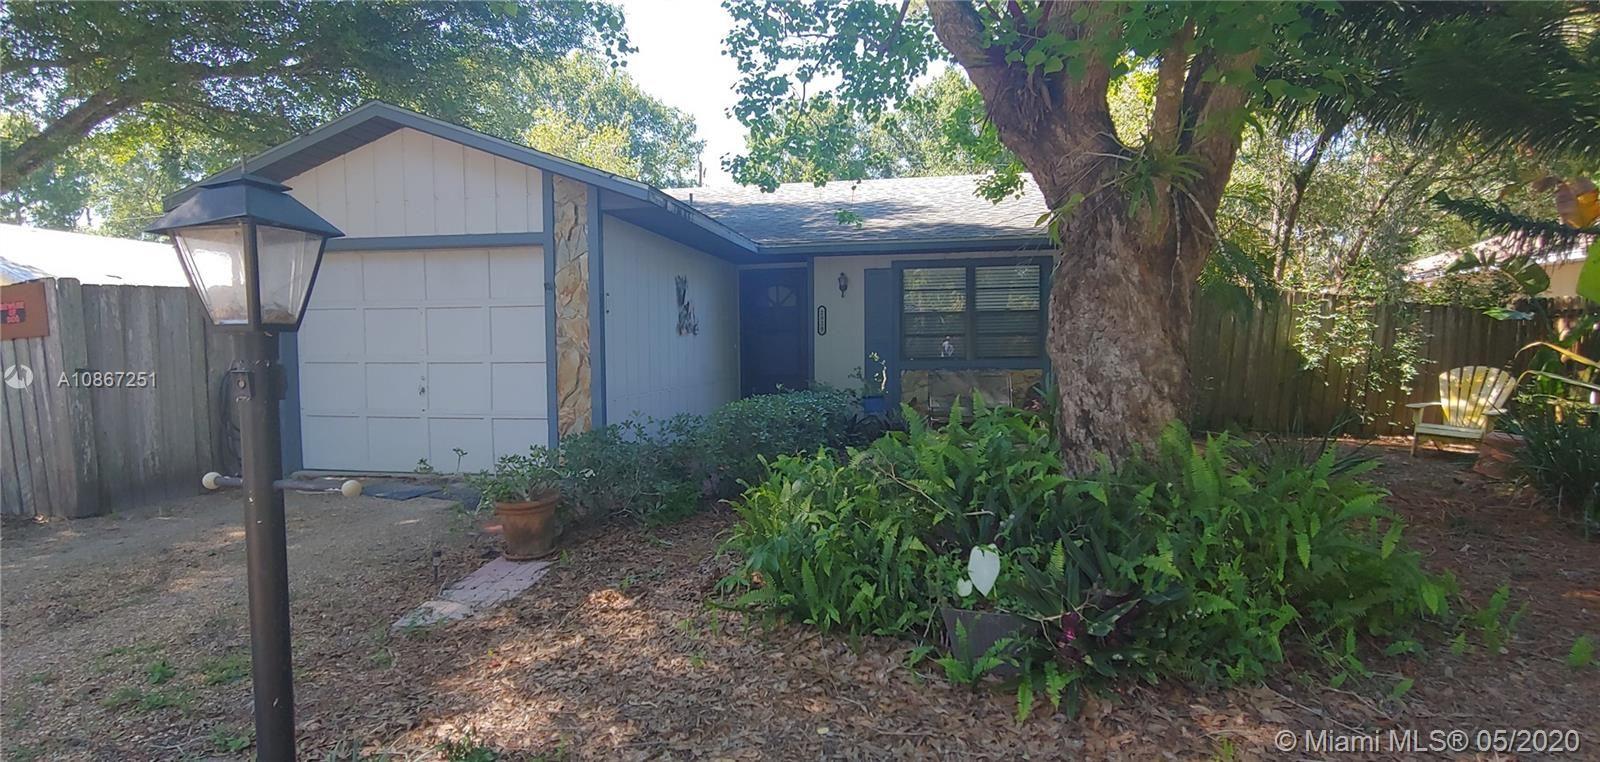 Photo of 2824 SW 6th St SW, Vero Beach, FL 32968 (MLS # A10867251)